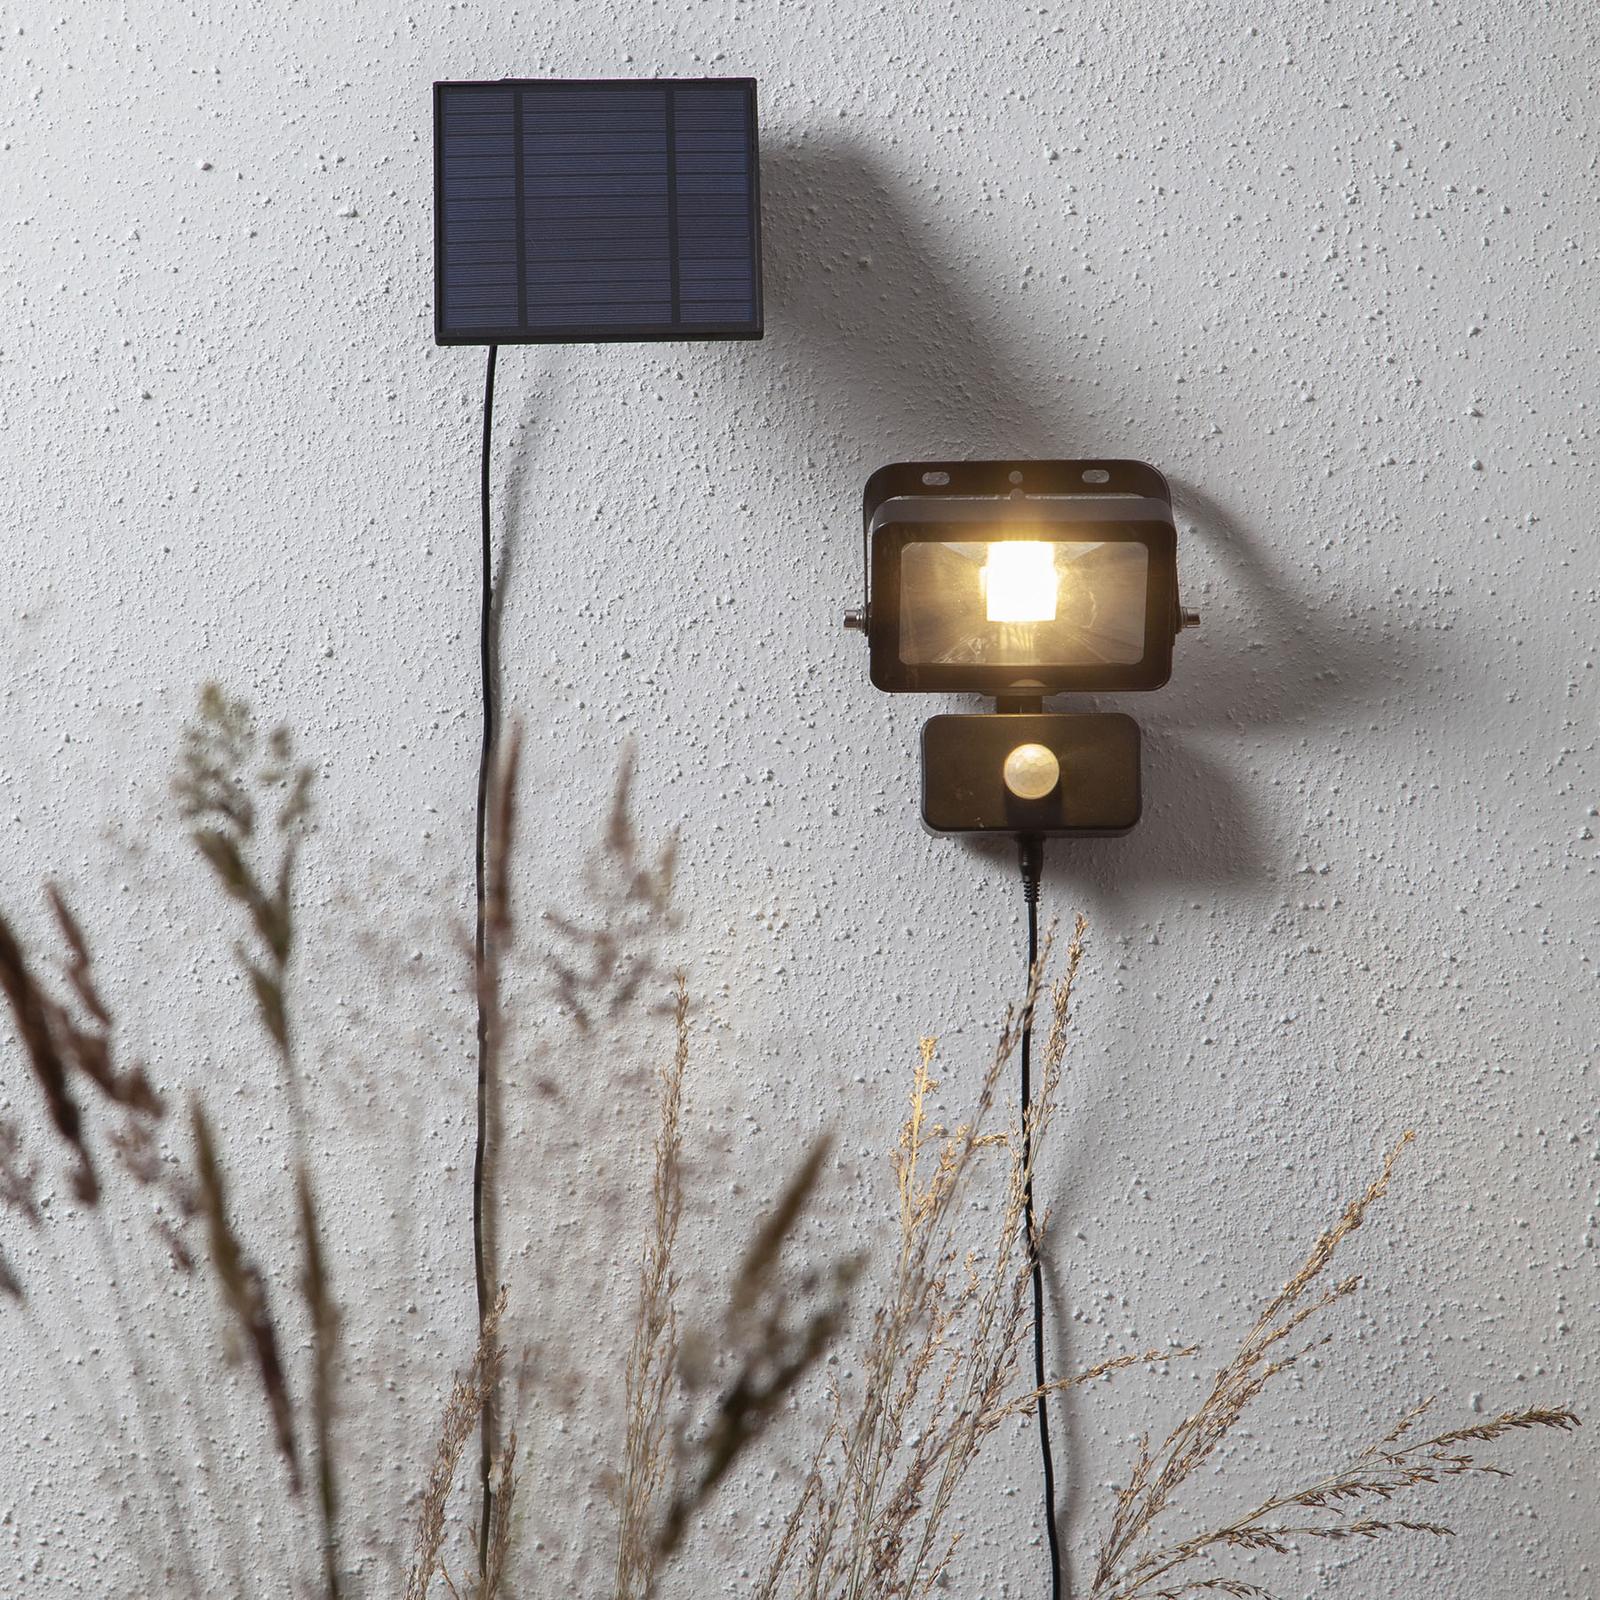 Lampa solarna LED Powerspot Sensor, pałąk, 800lm